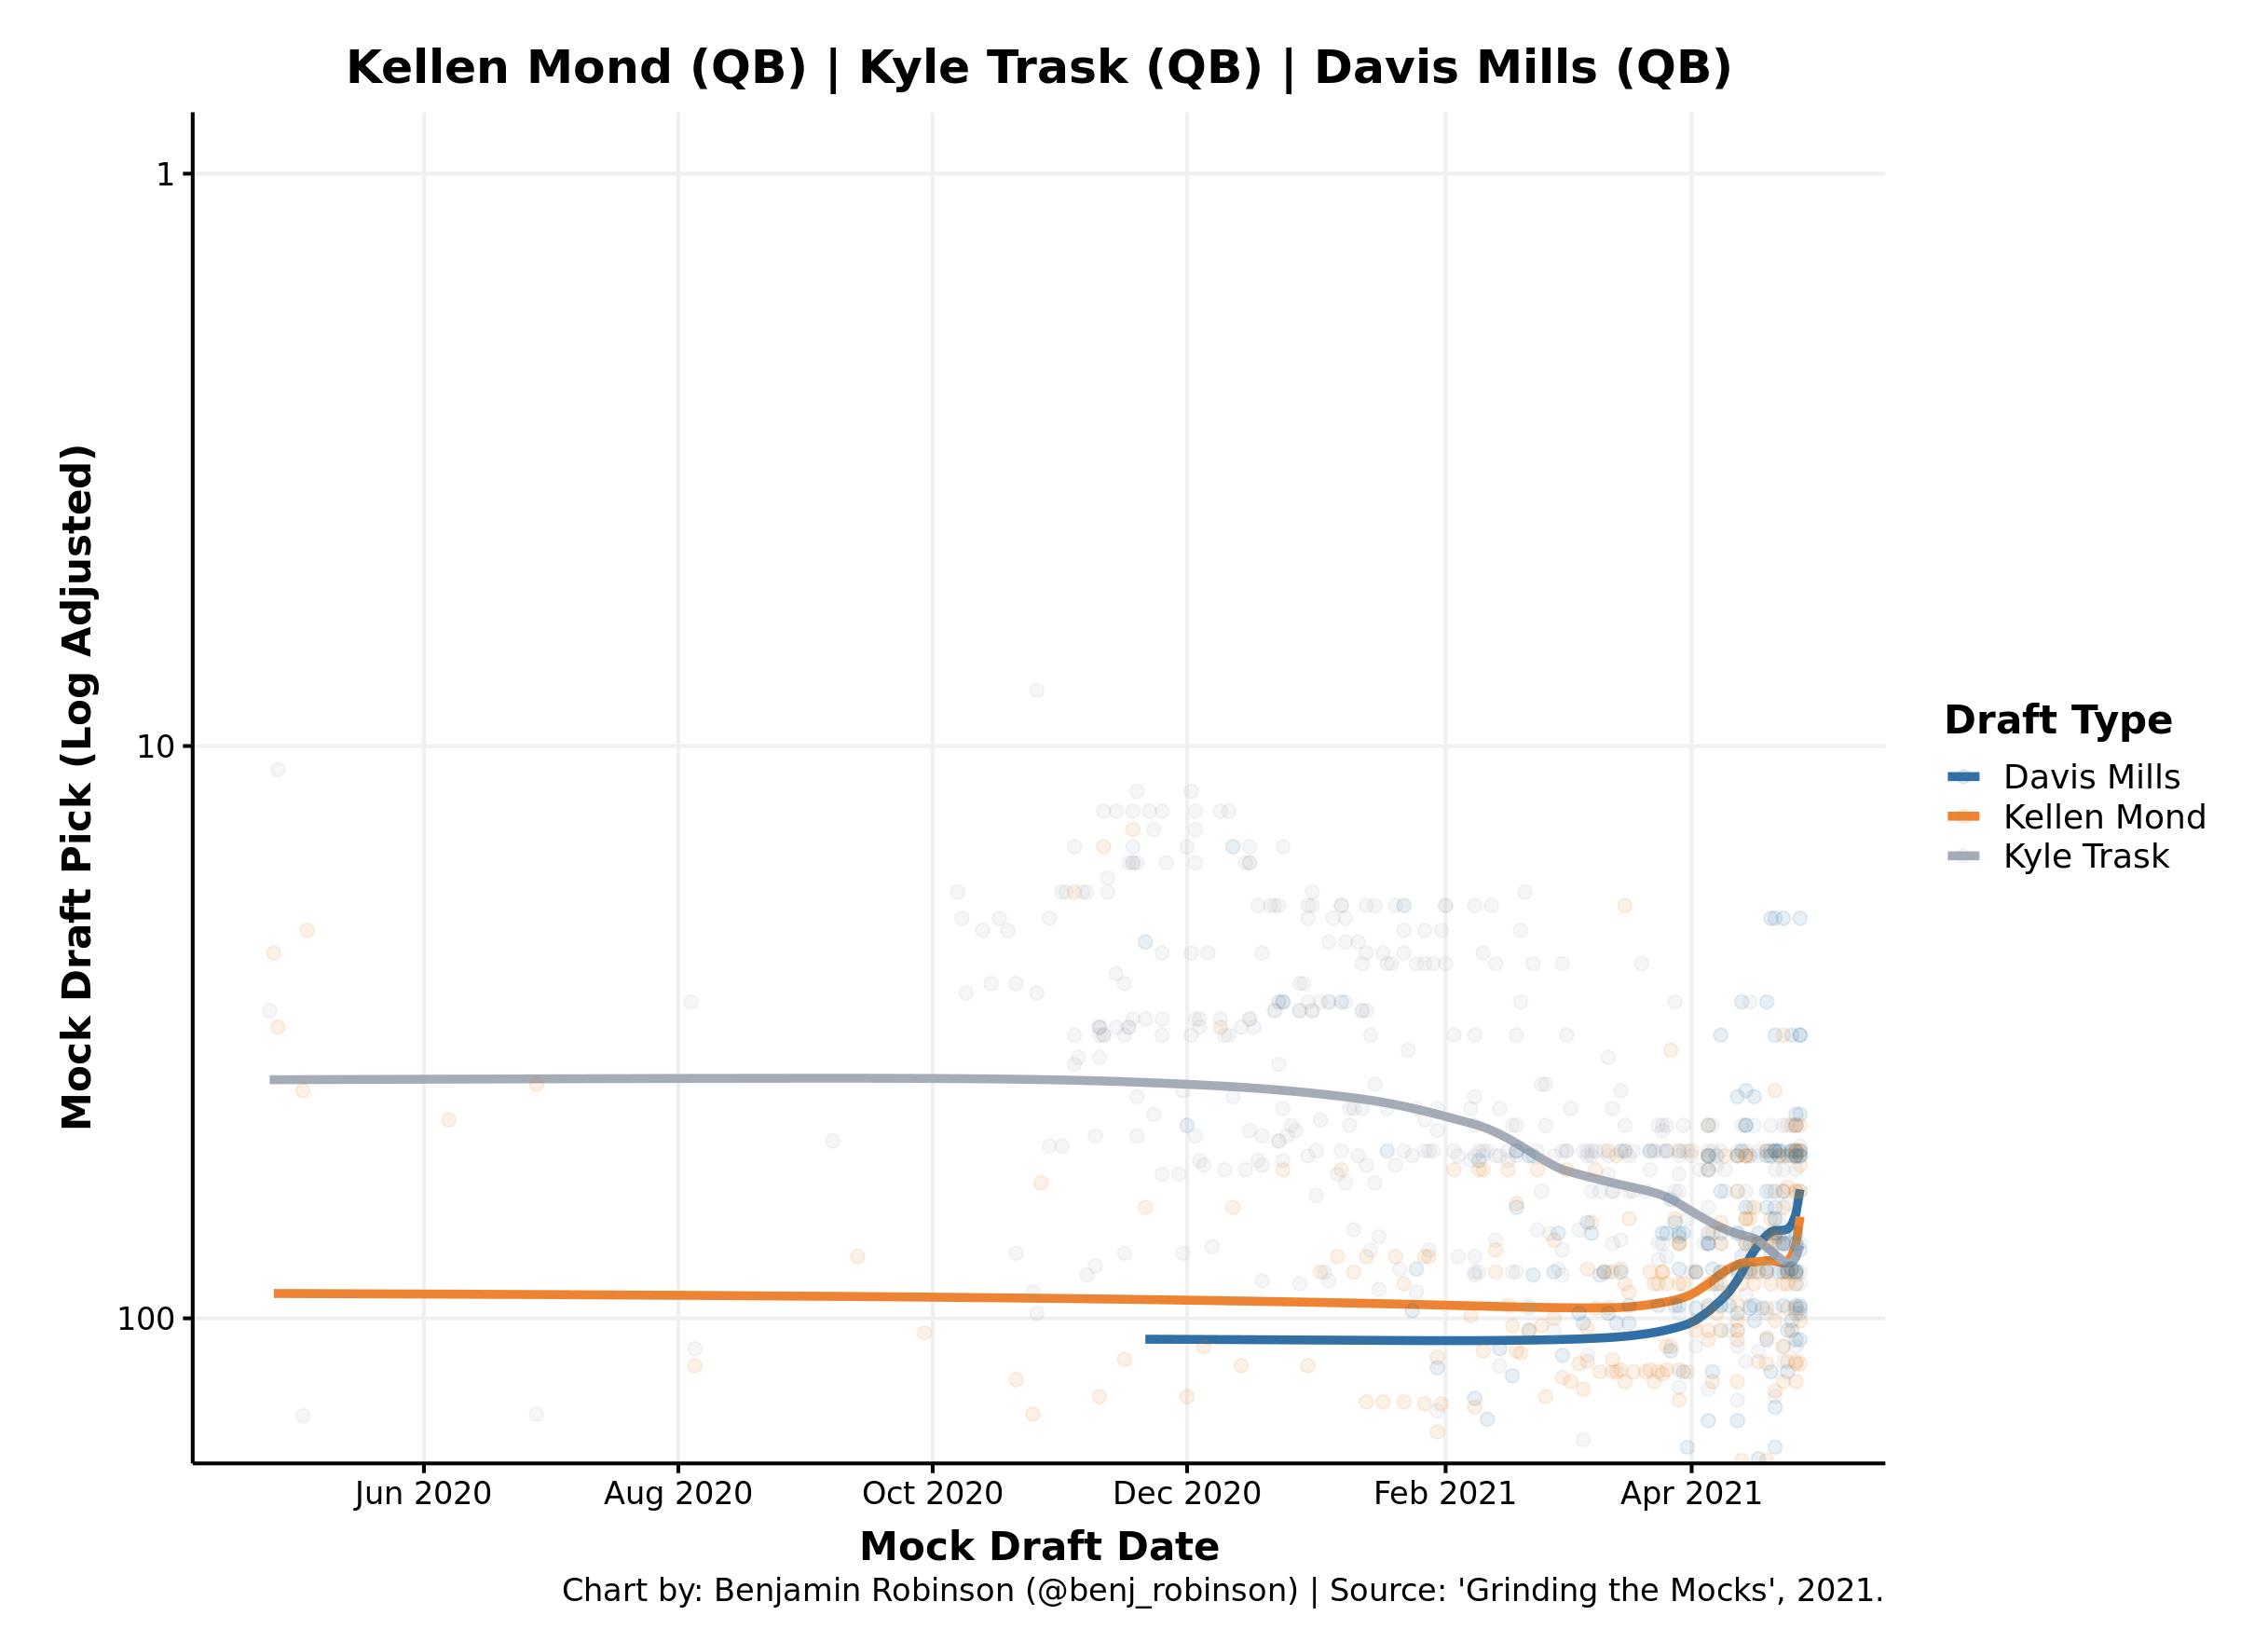 Kellen Mond, Kyle Trask, Davis Mills Expected Draft Position